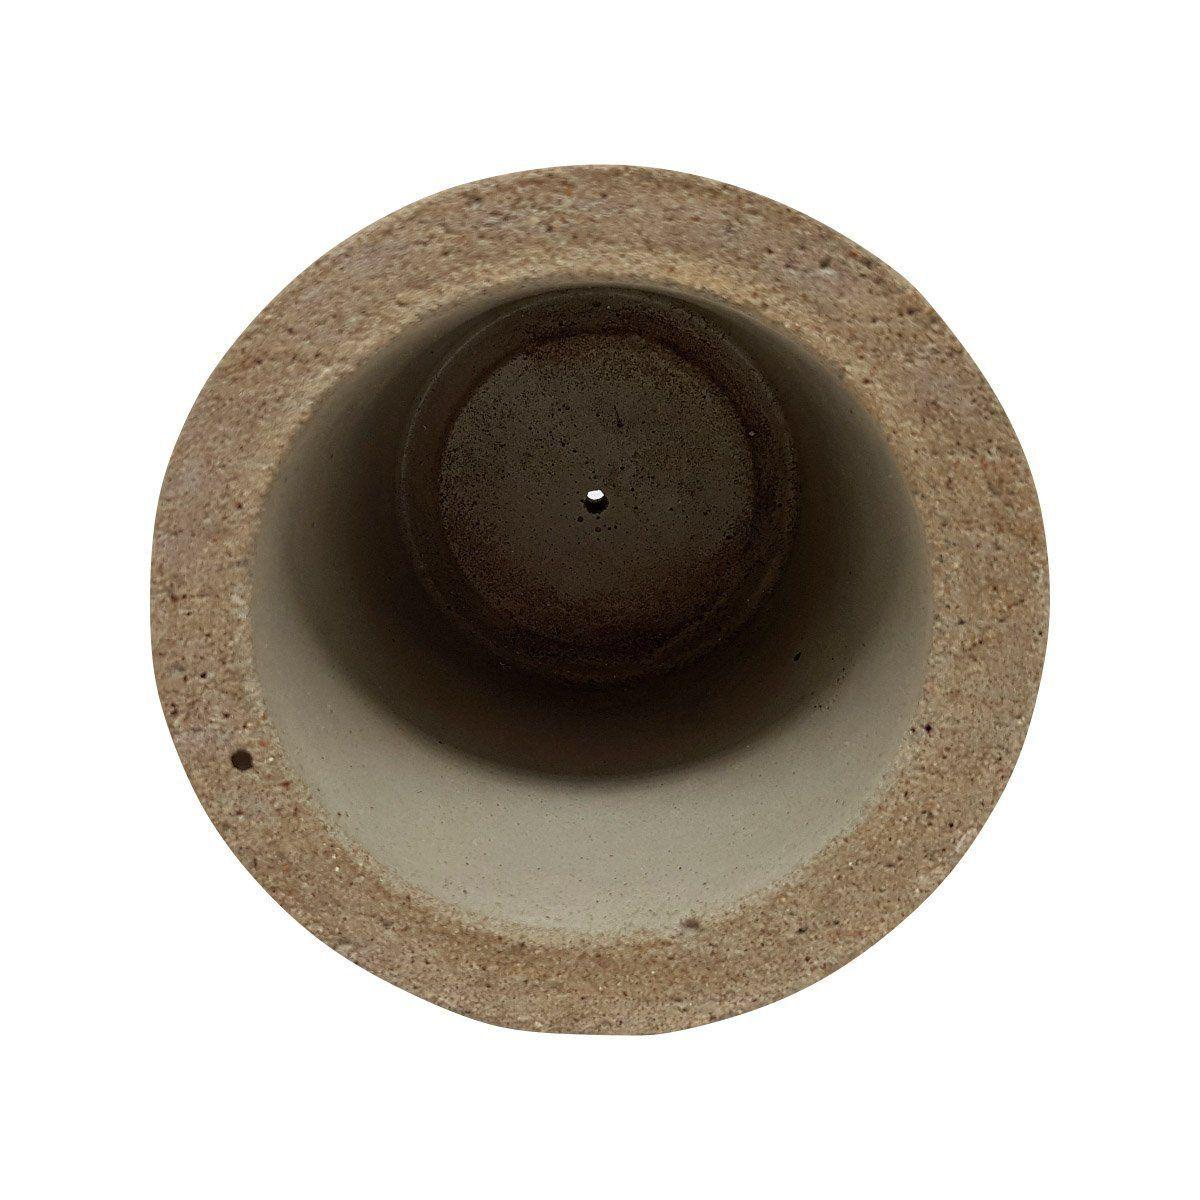 Vaso de cimento 11cm x 11,5cm MD05